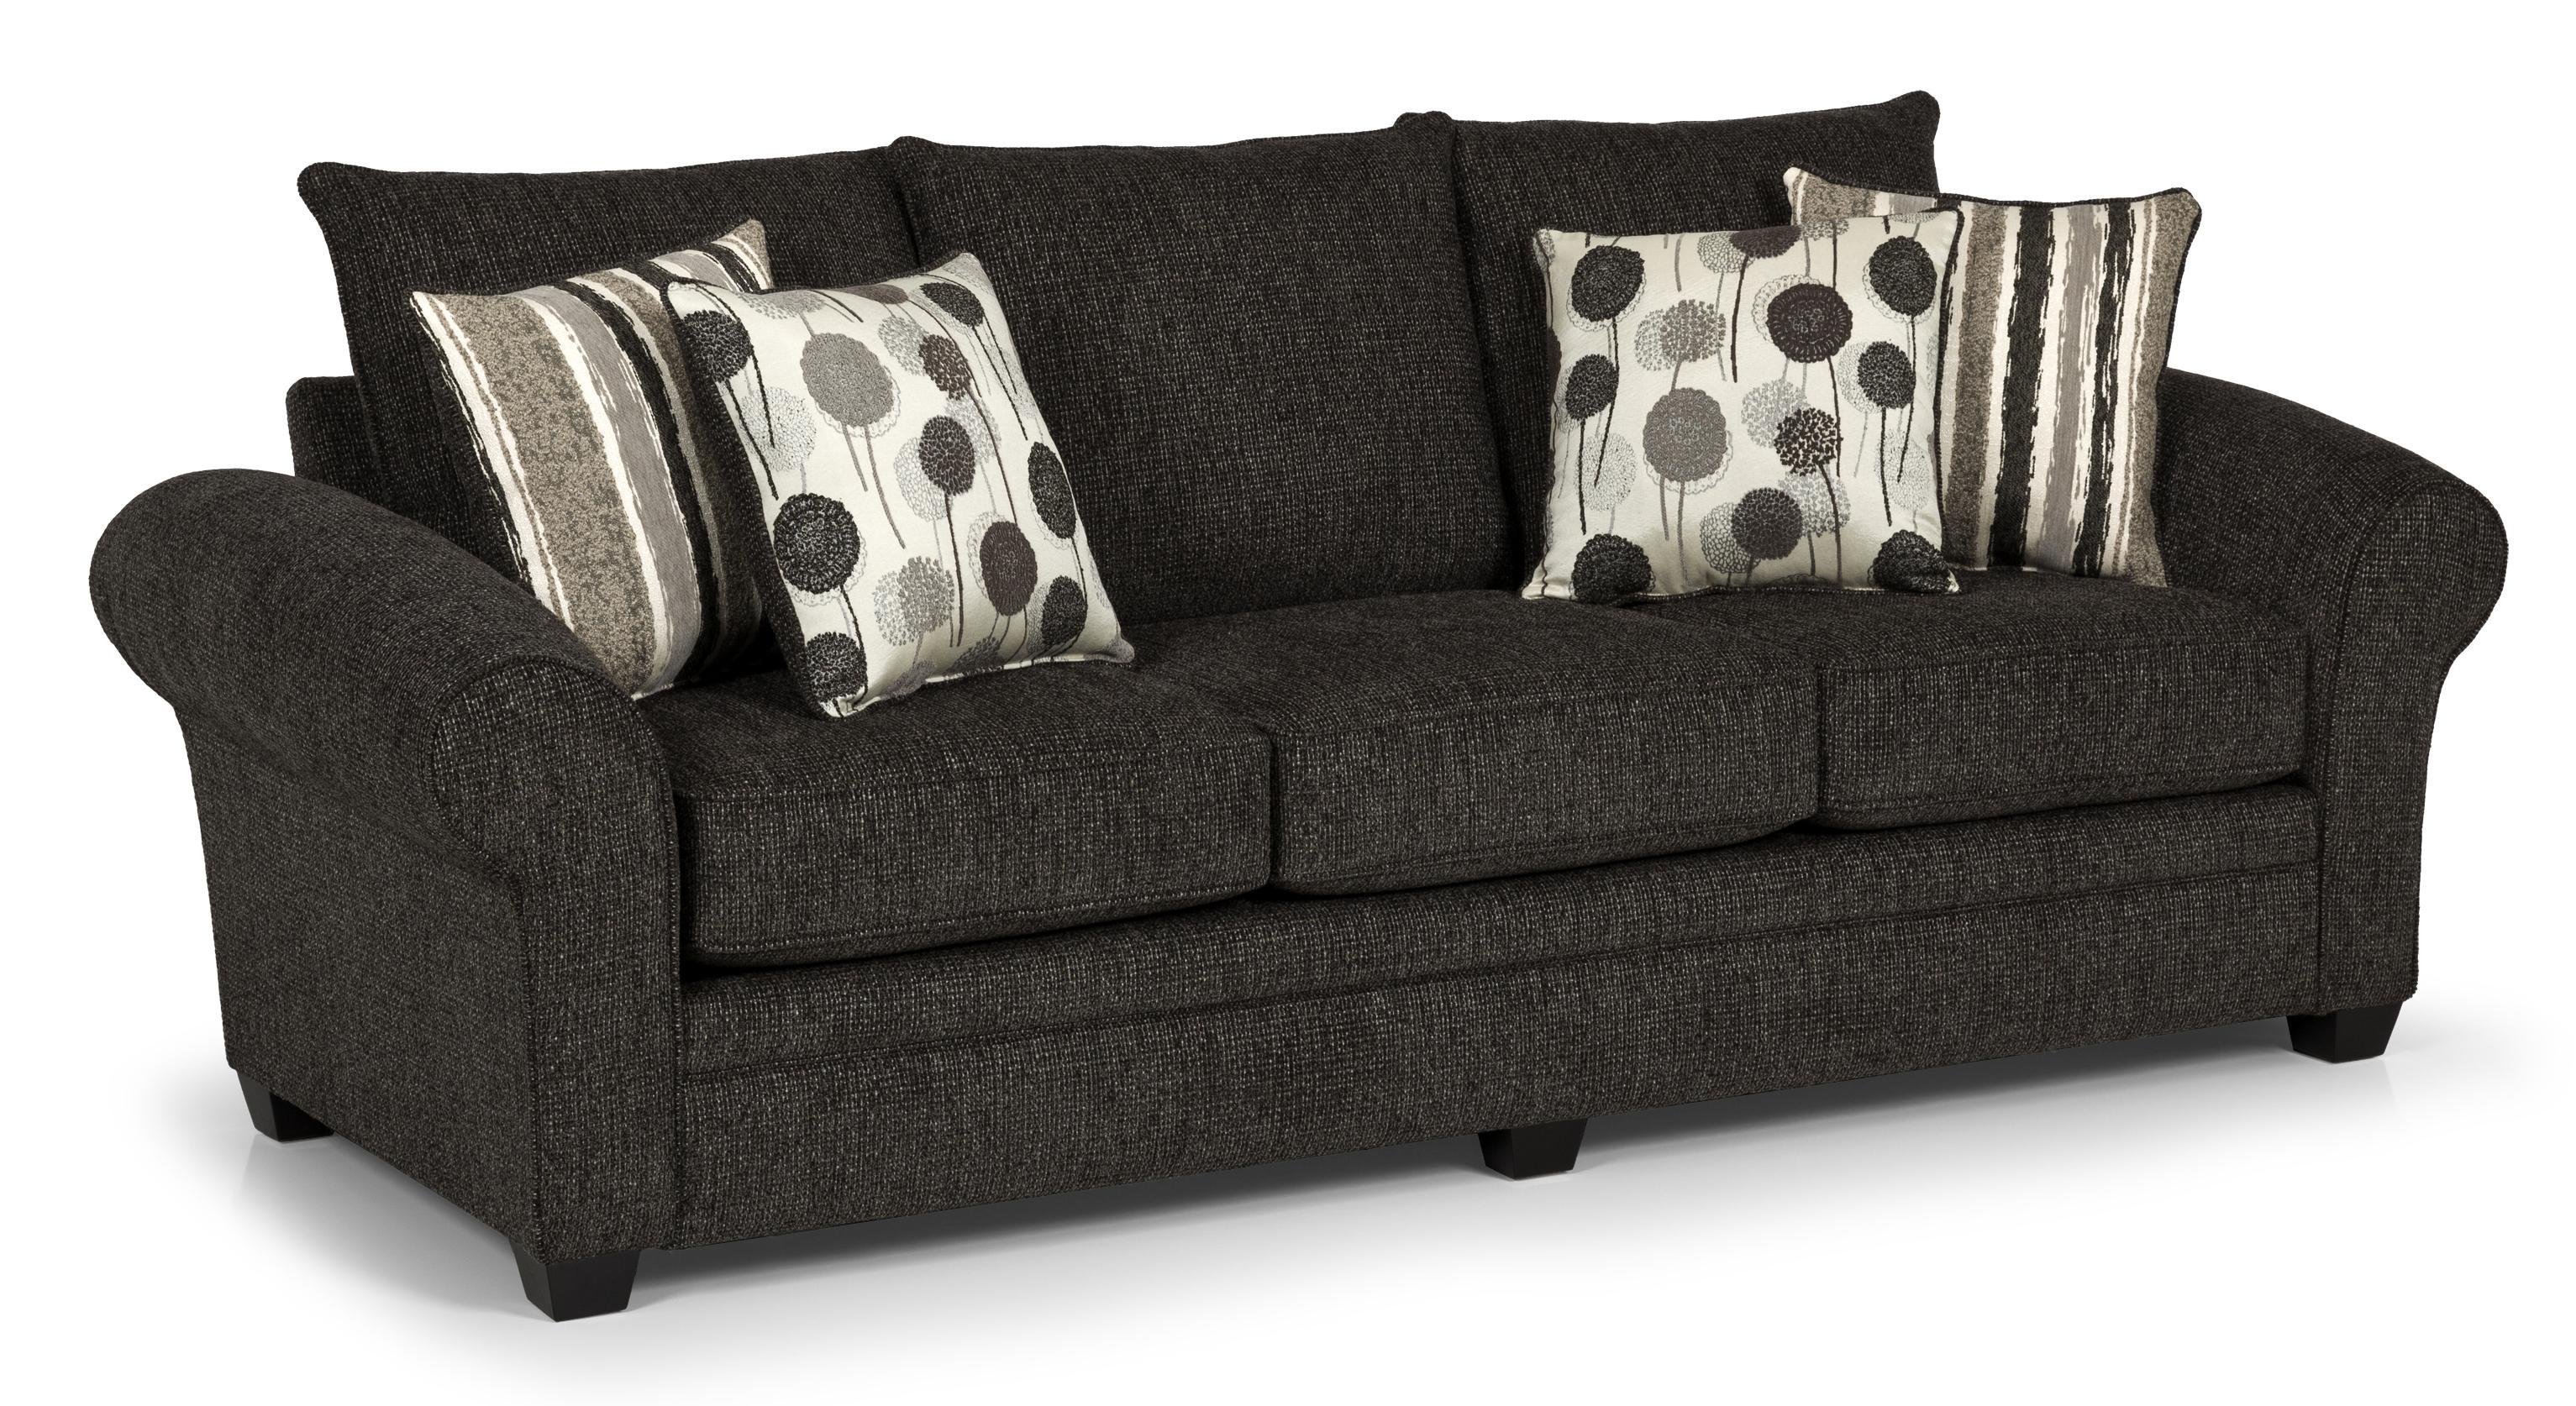 Stanton 206 3 Over 3 Sofa - Item Number: 206-01